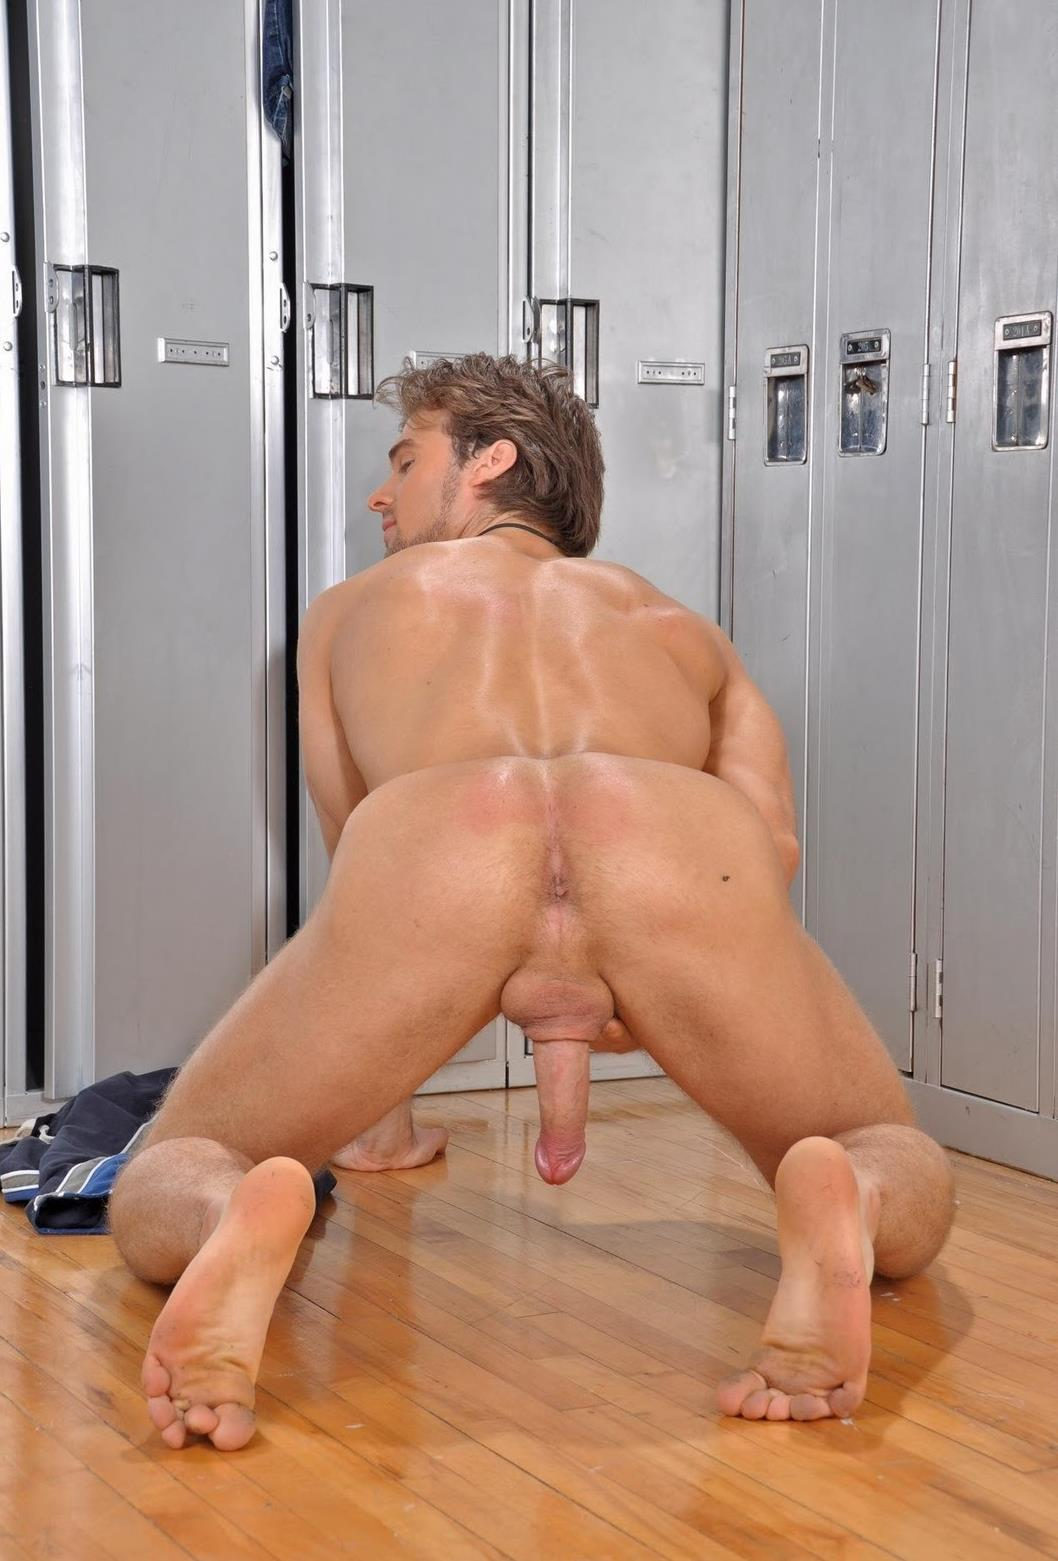 Naked guy ass